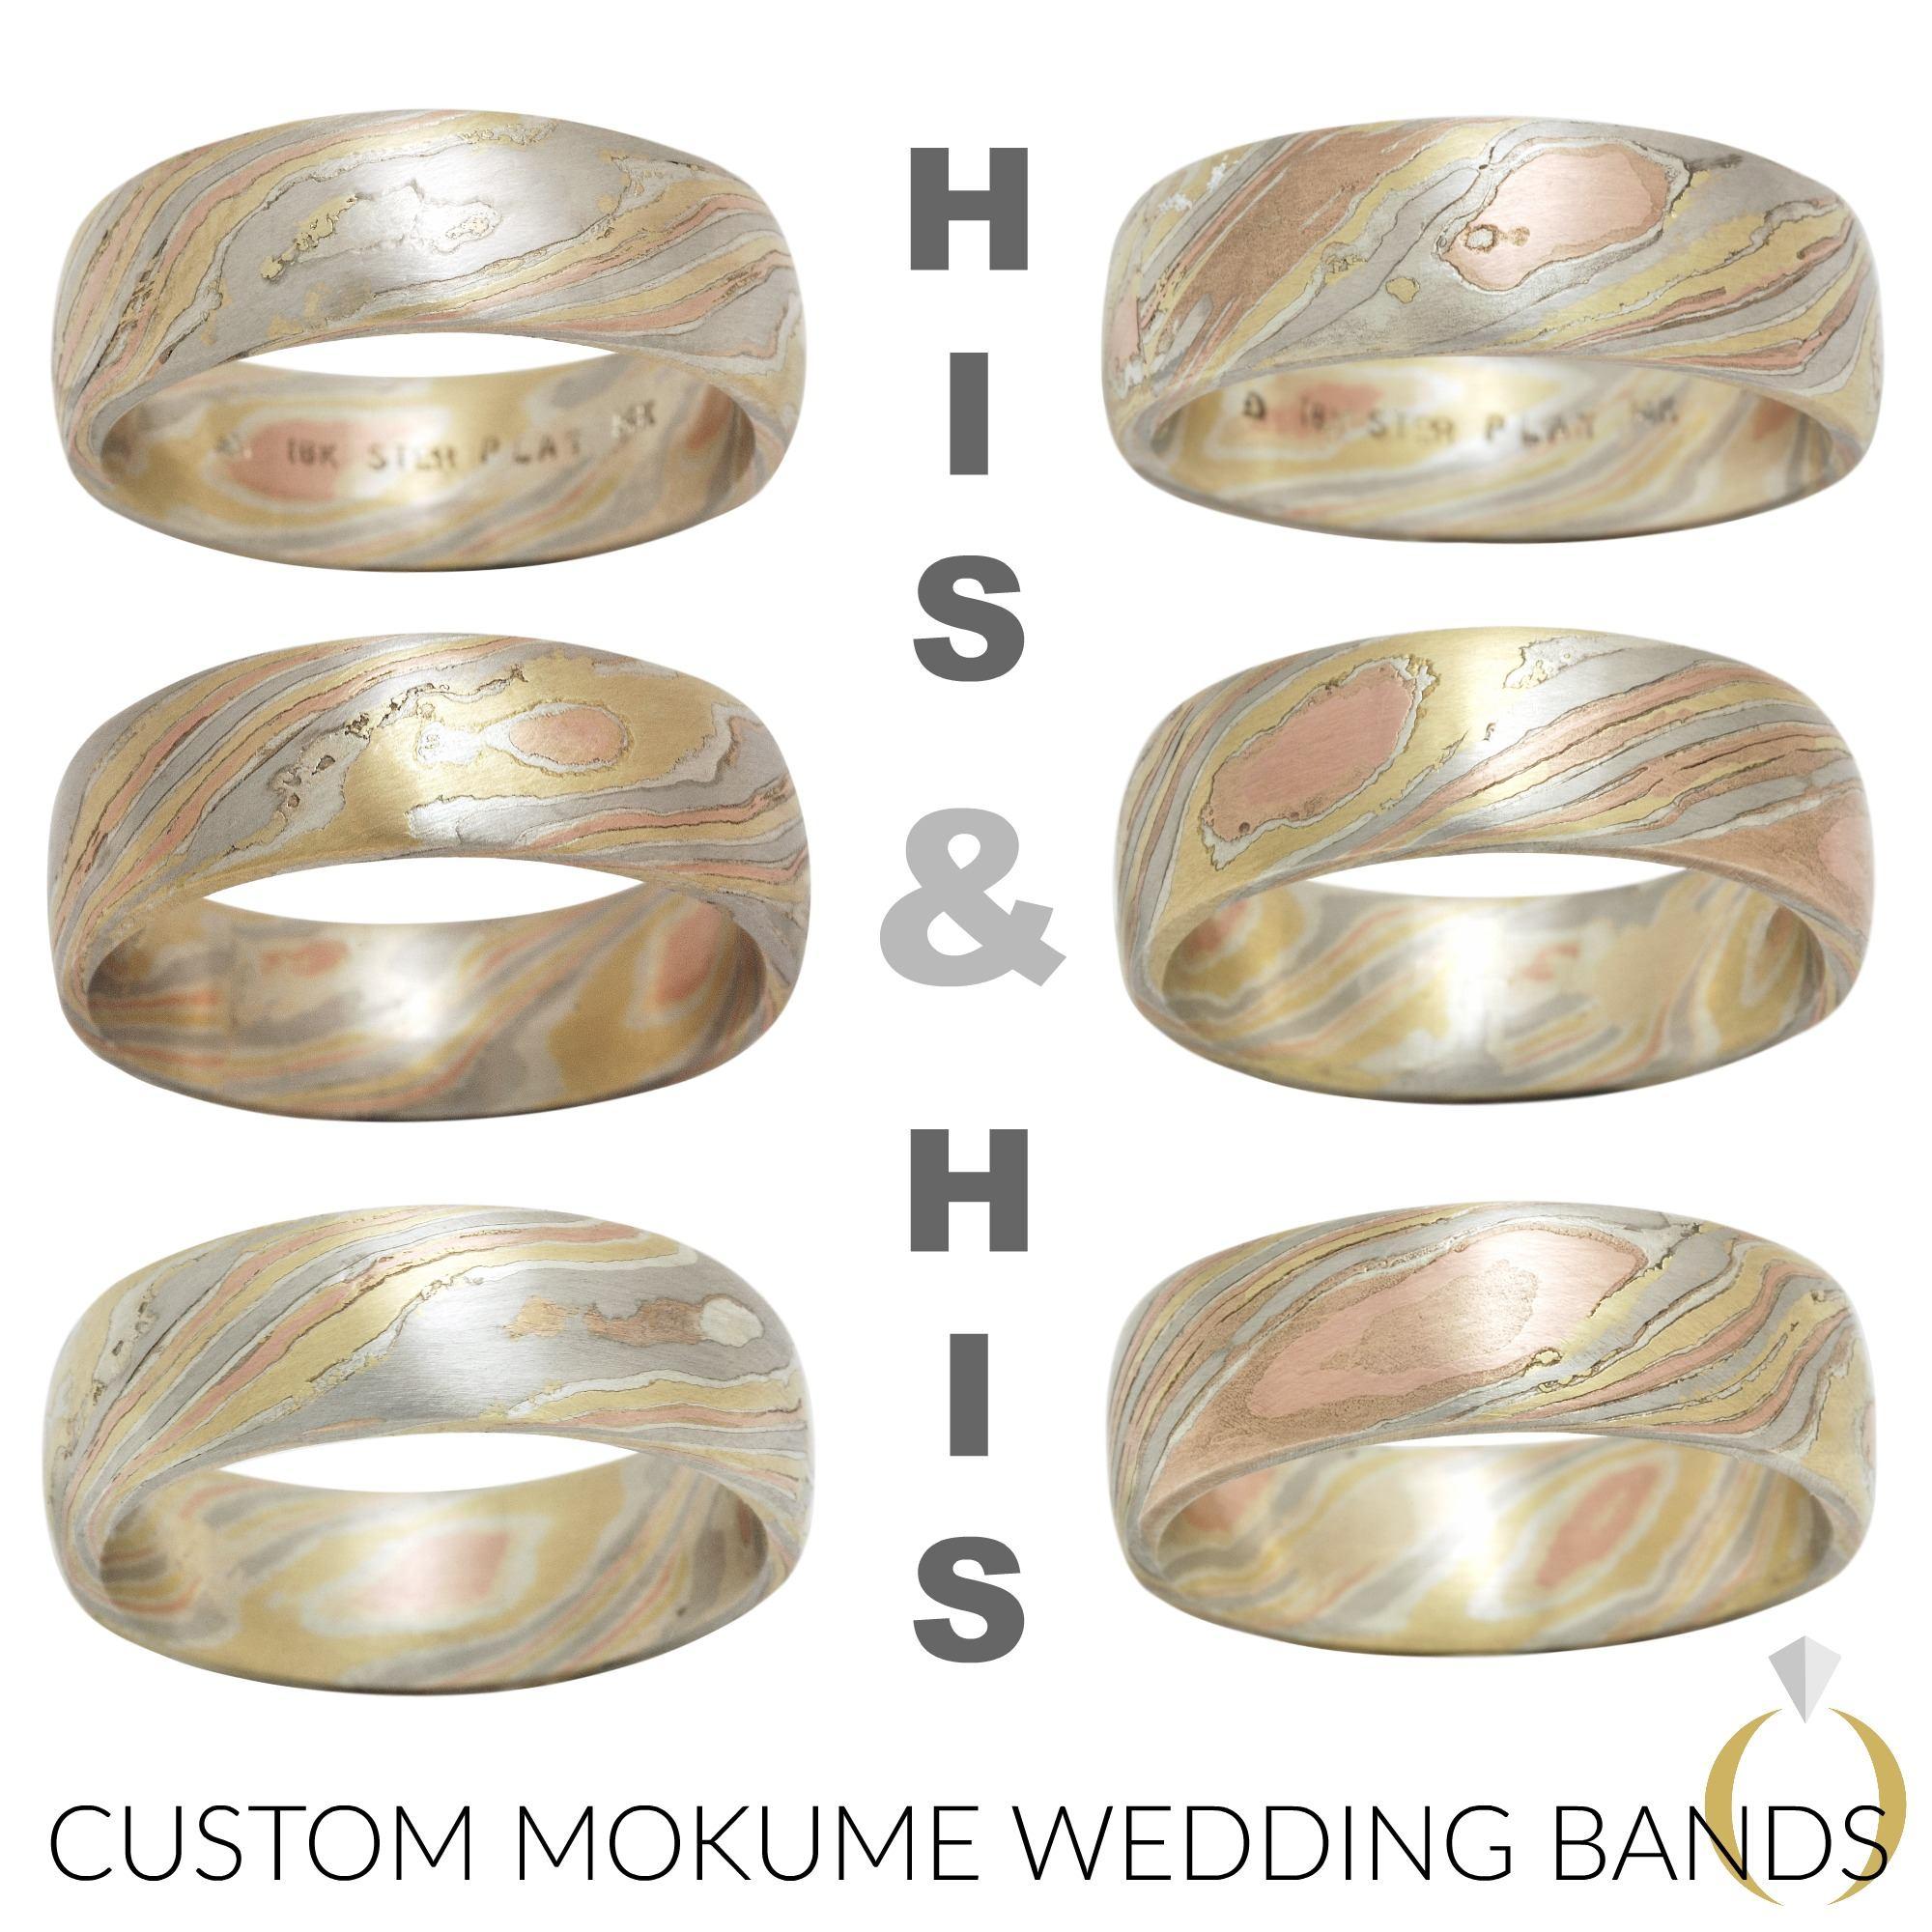 His & His Custom Mokume Gane Wedding Bands